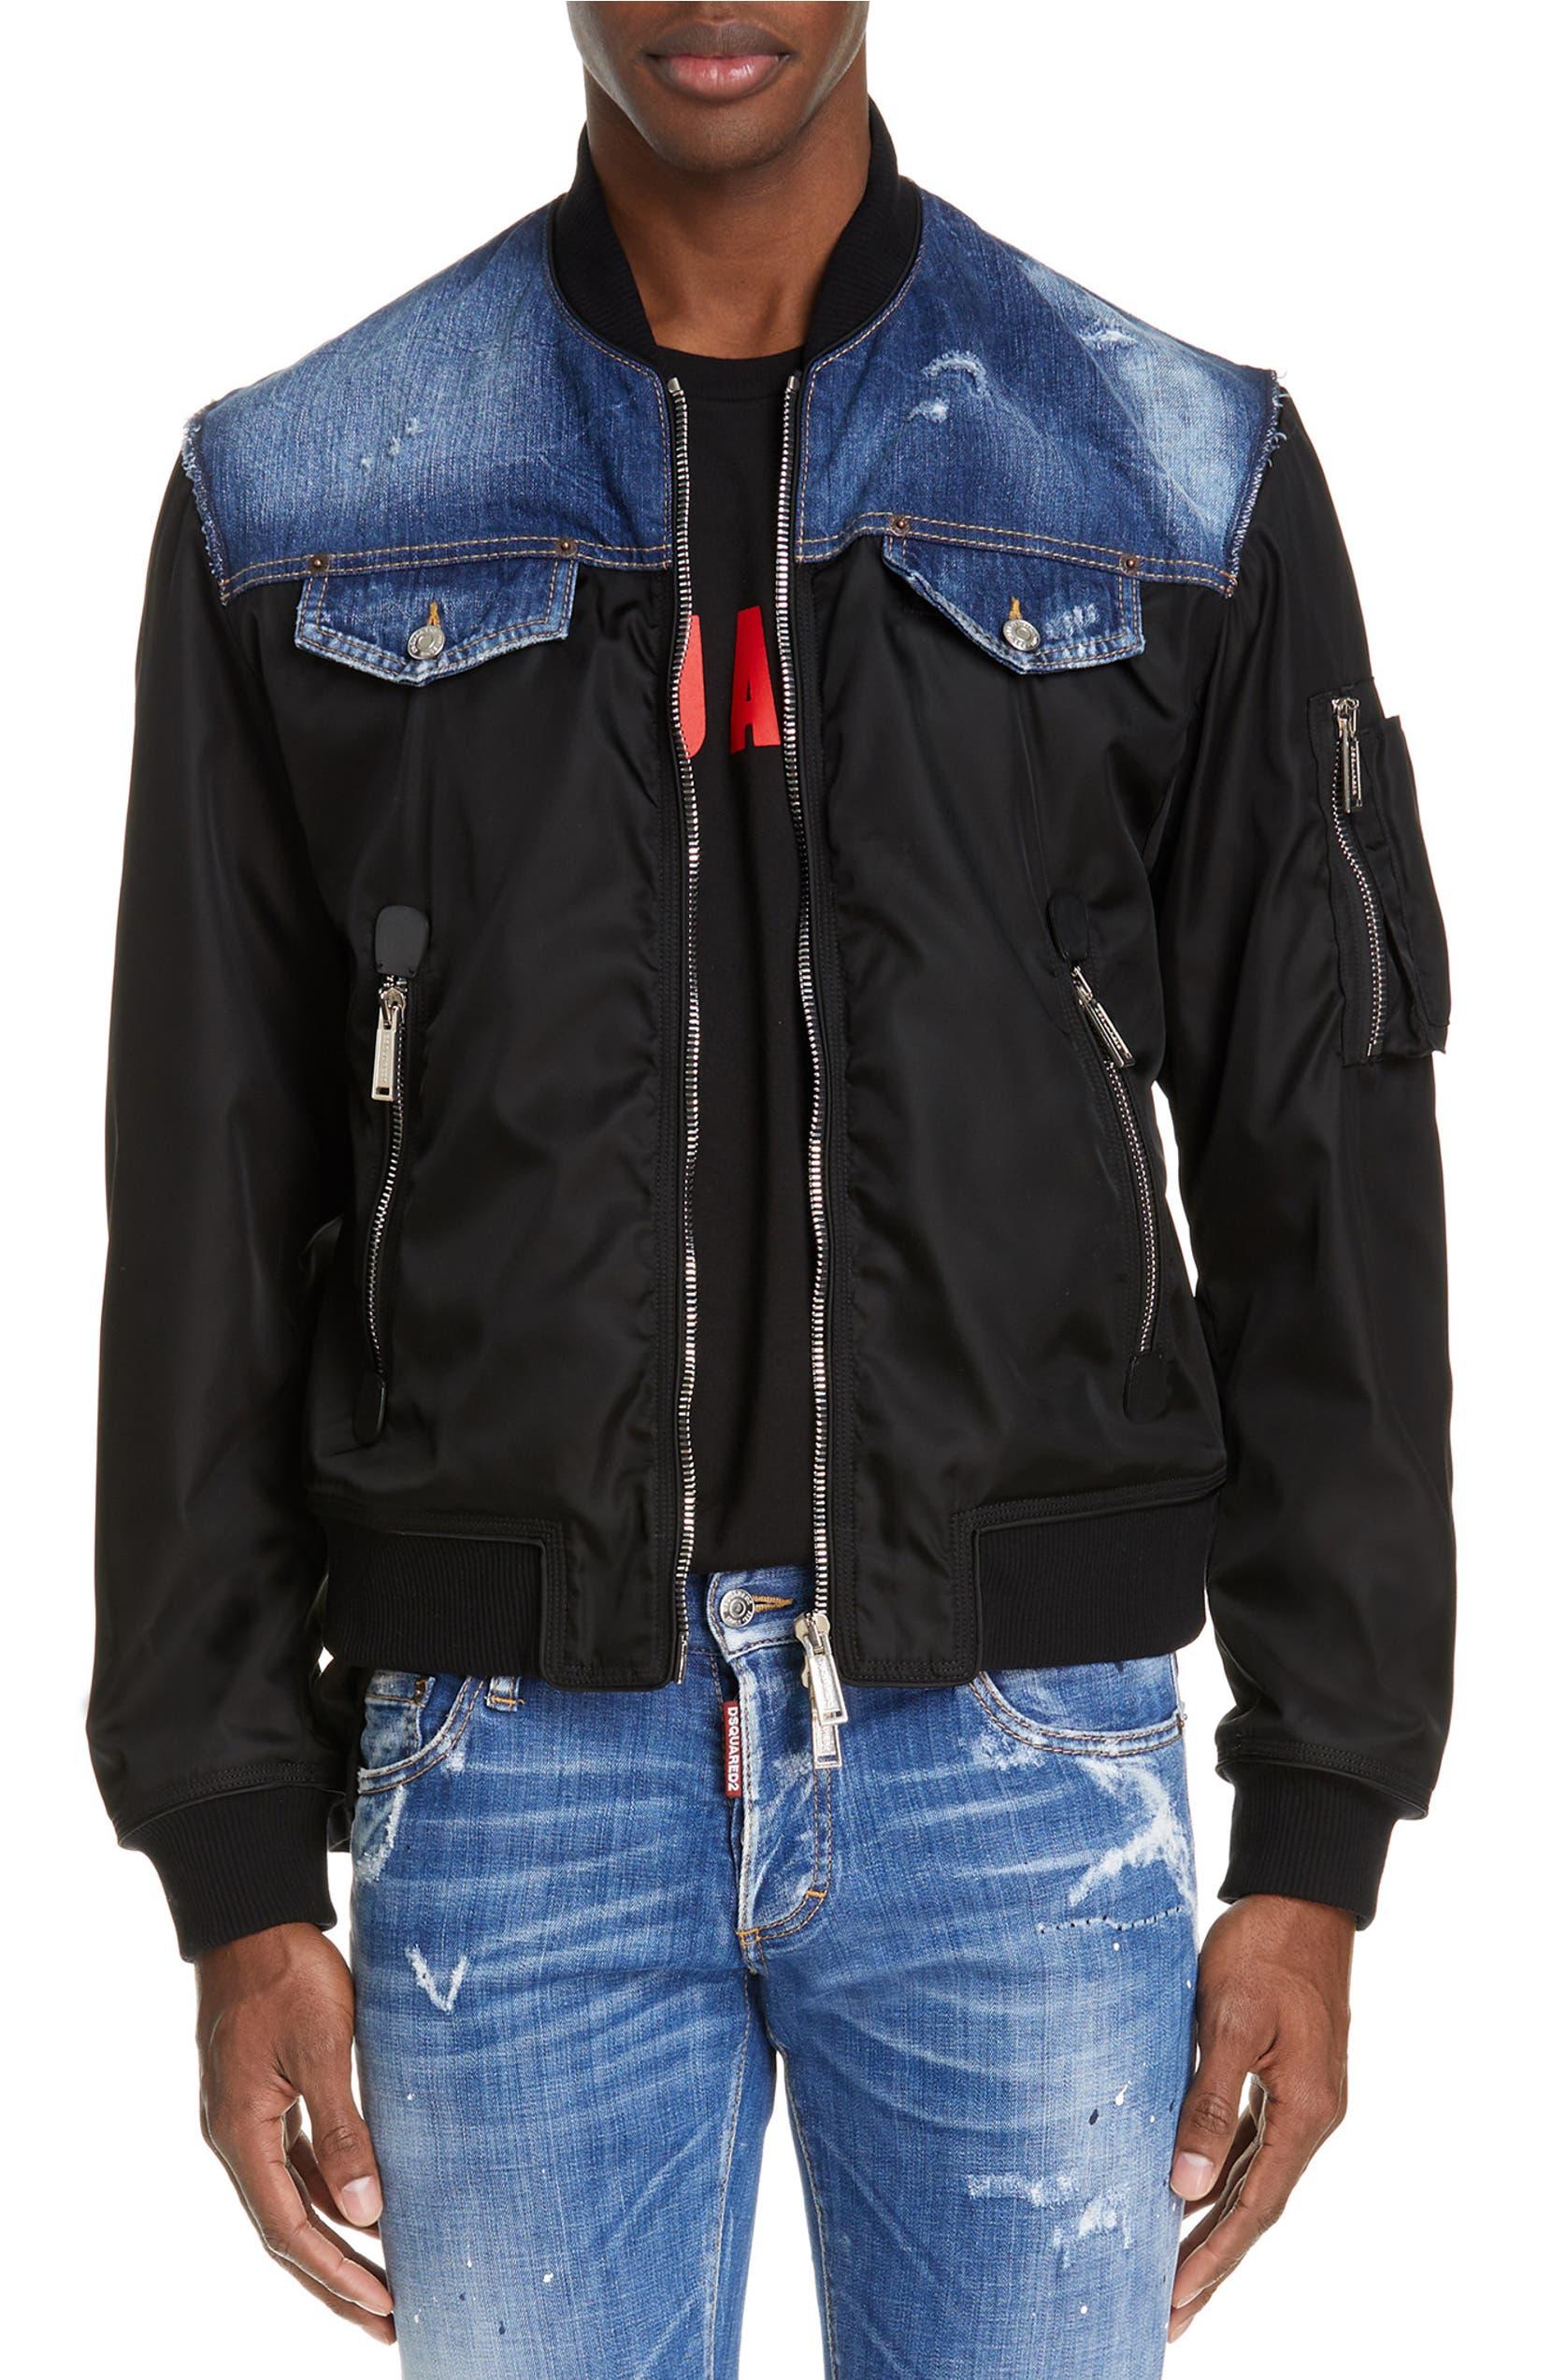 30613470b Dsquared2 Nylon Bomber Jacket with Denim Yokes (Regular Retail Price ...